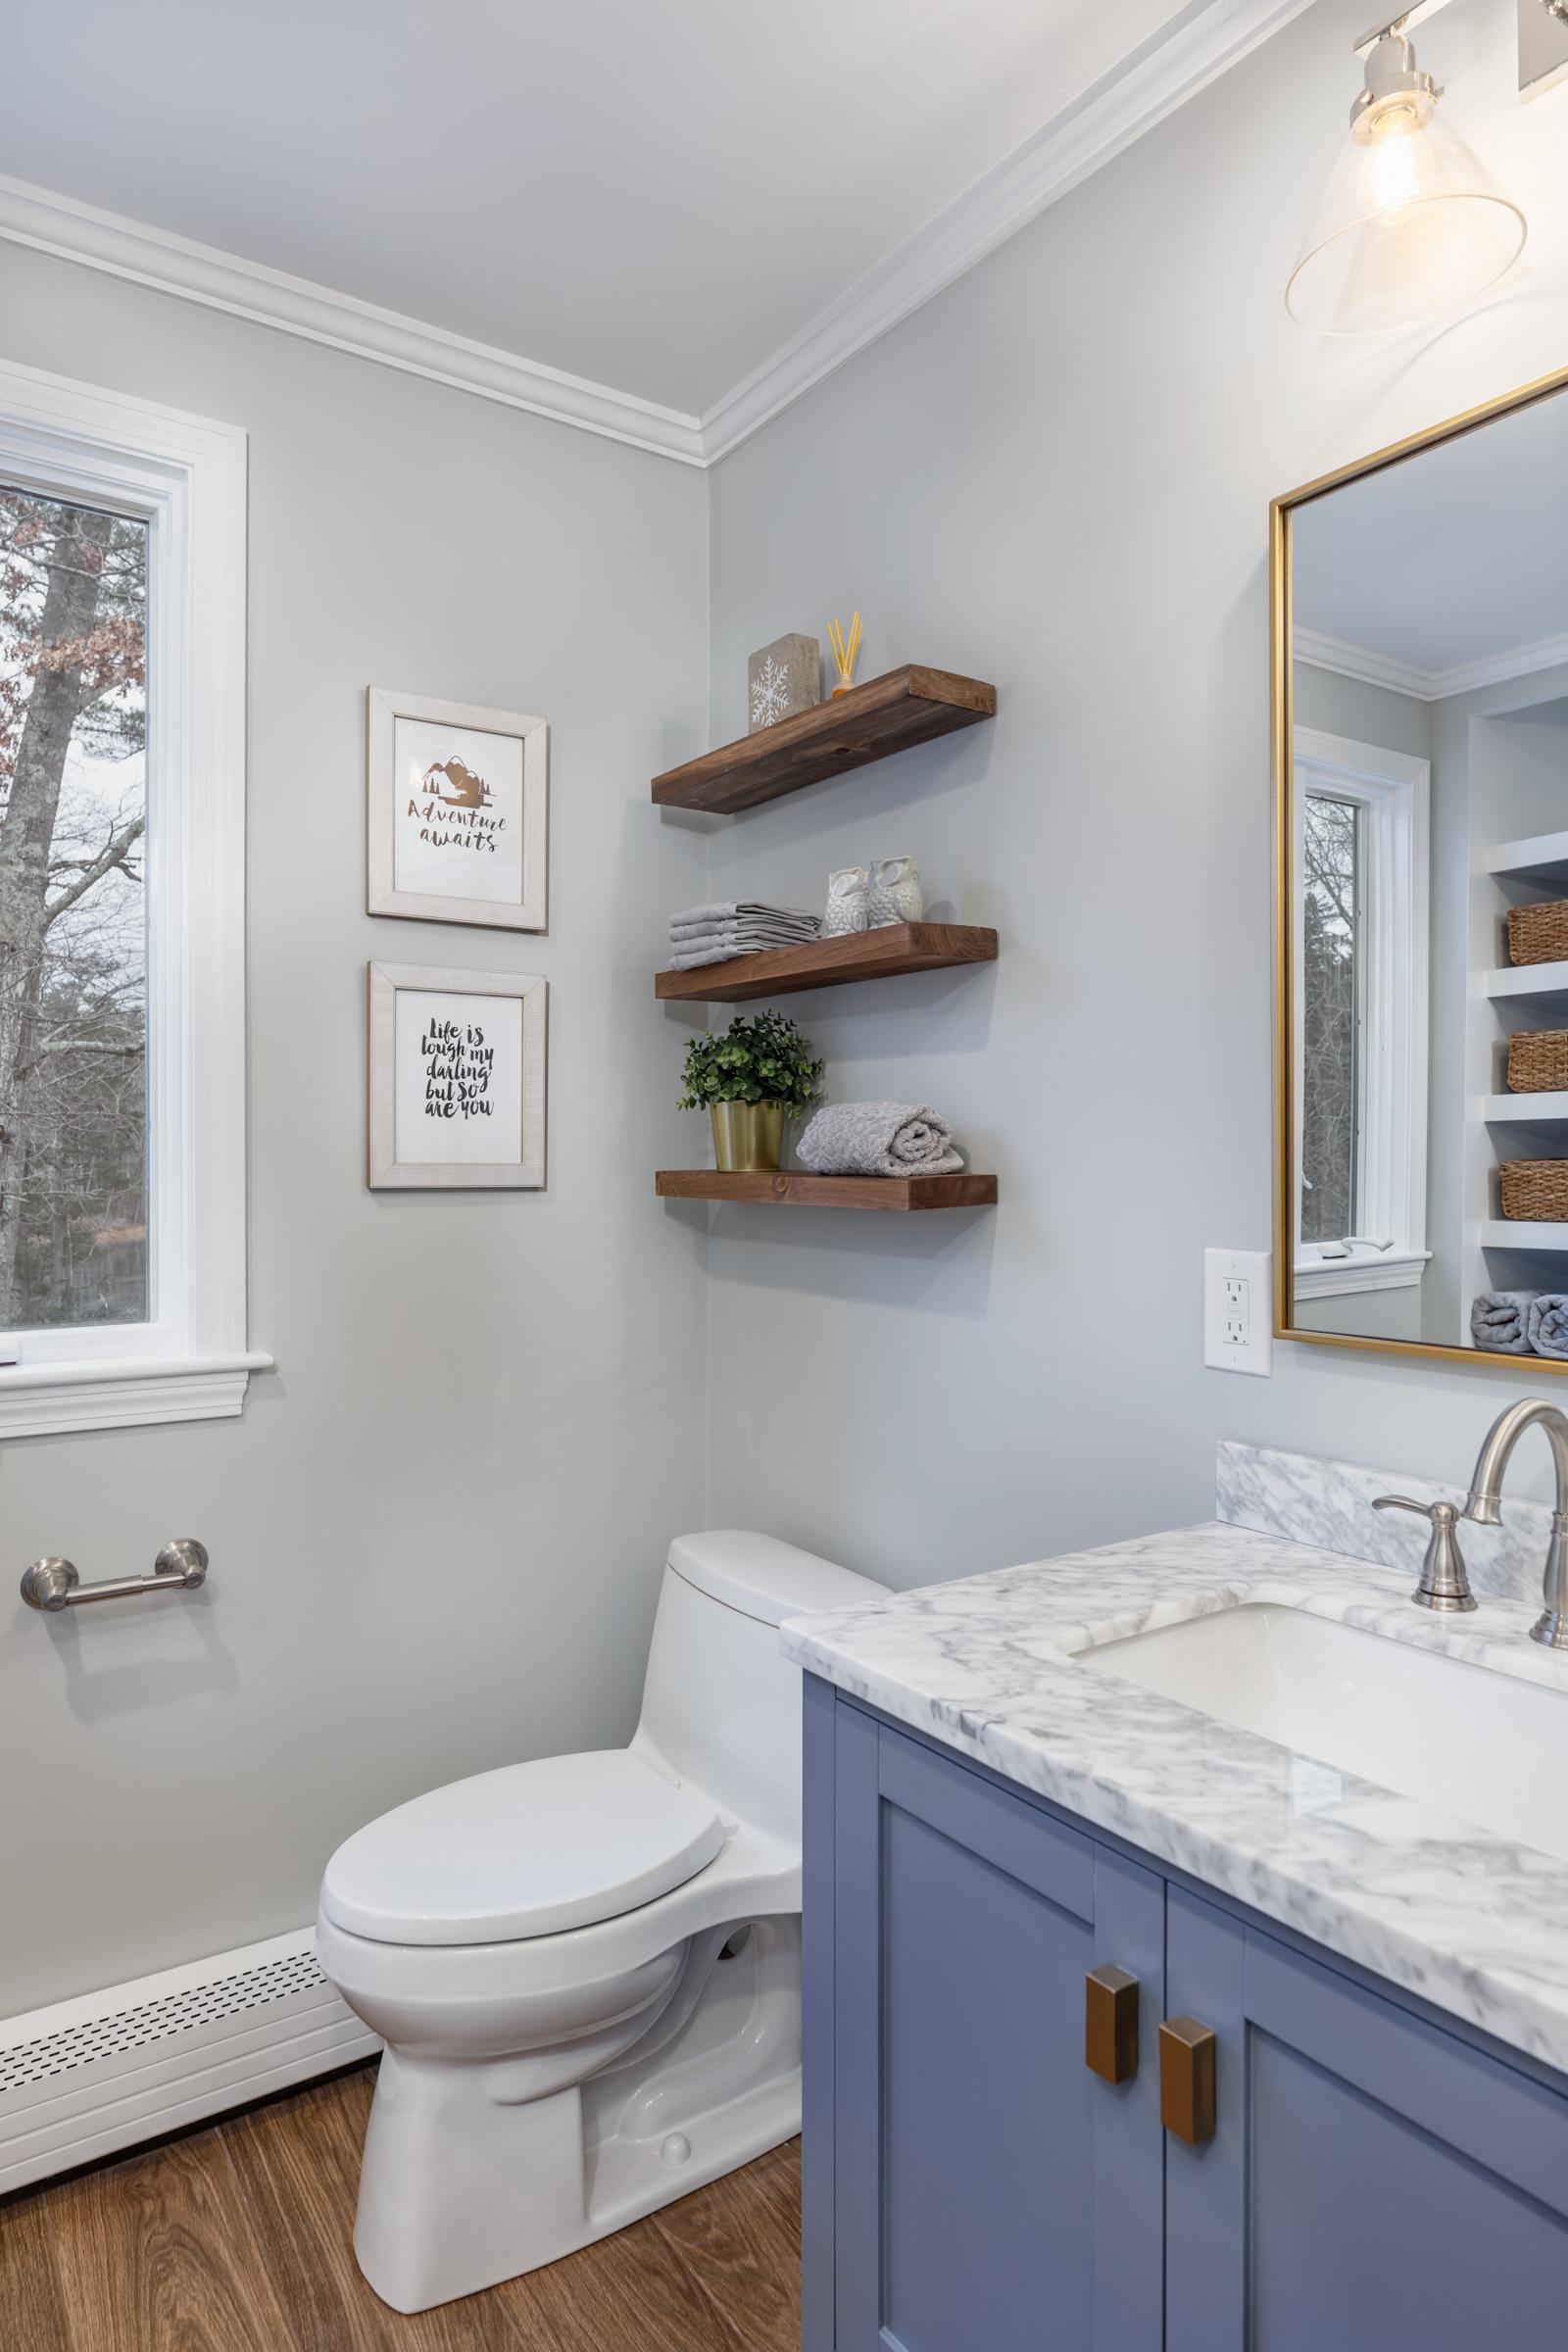 Vanity toilet shelves and built-in reflection.jpg